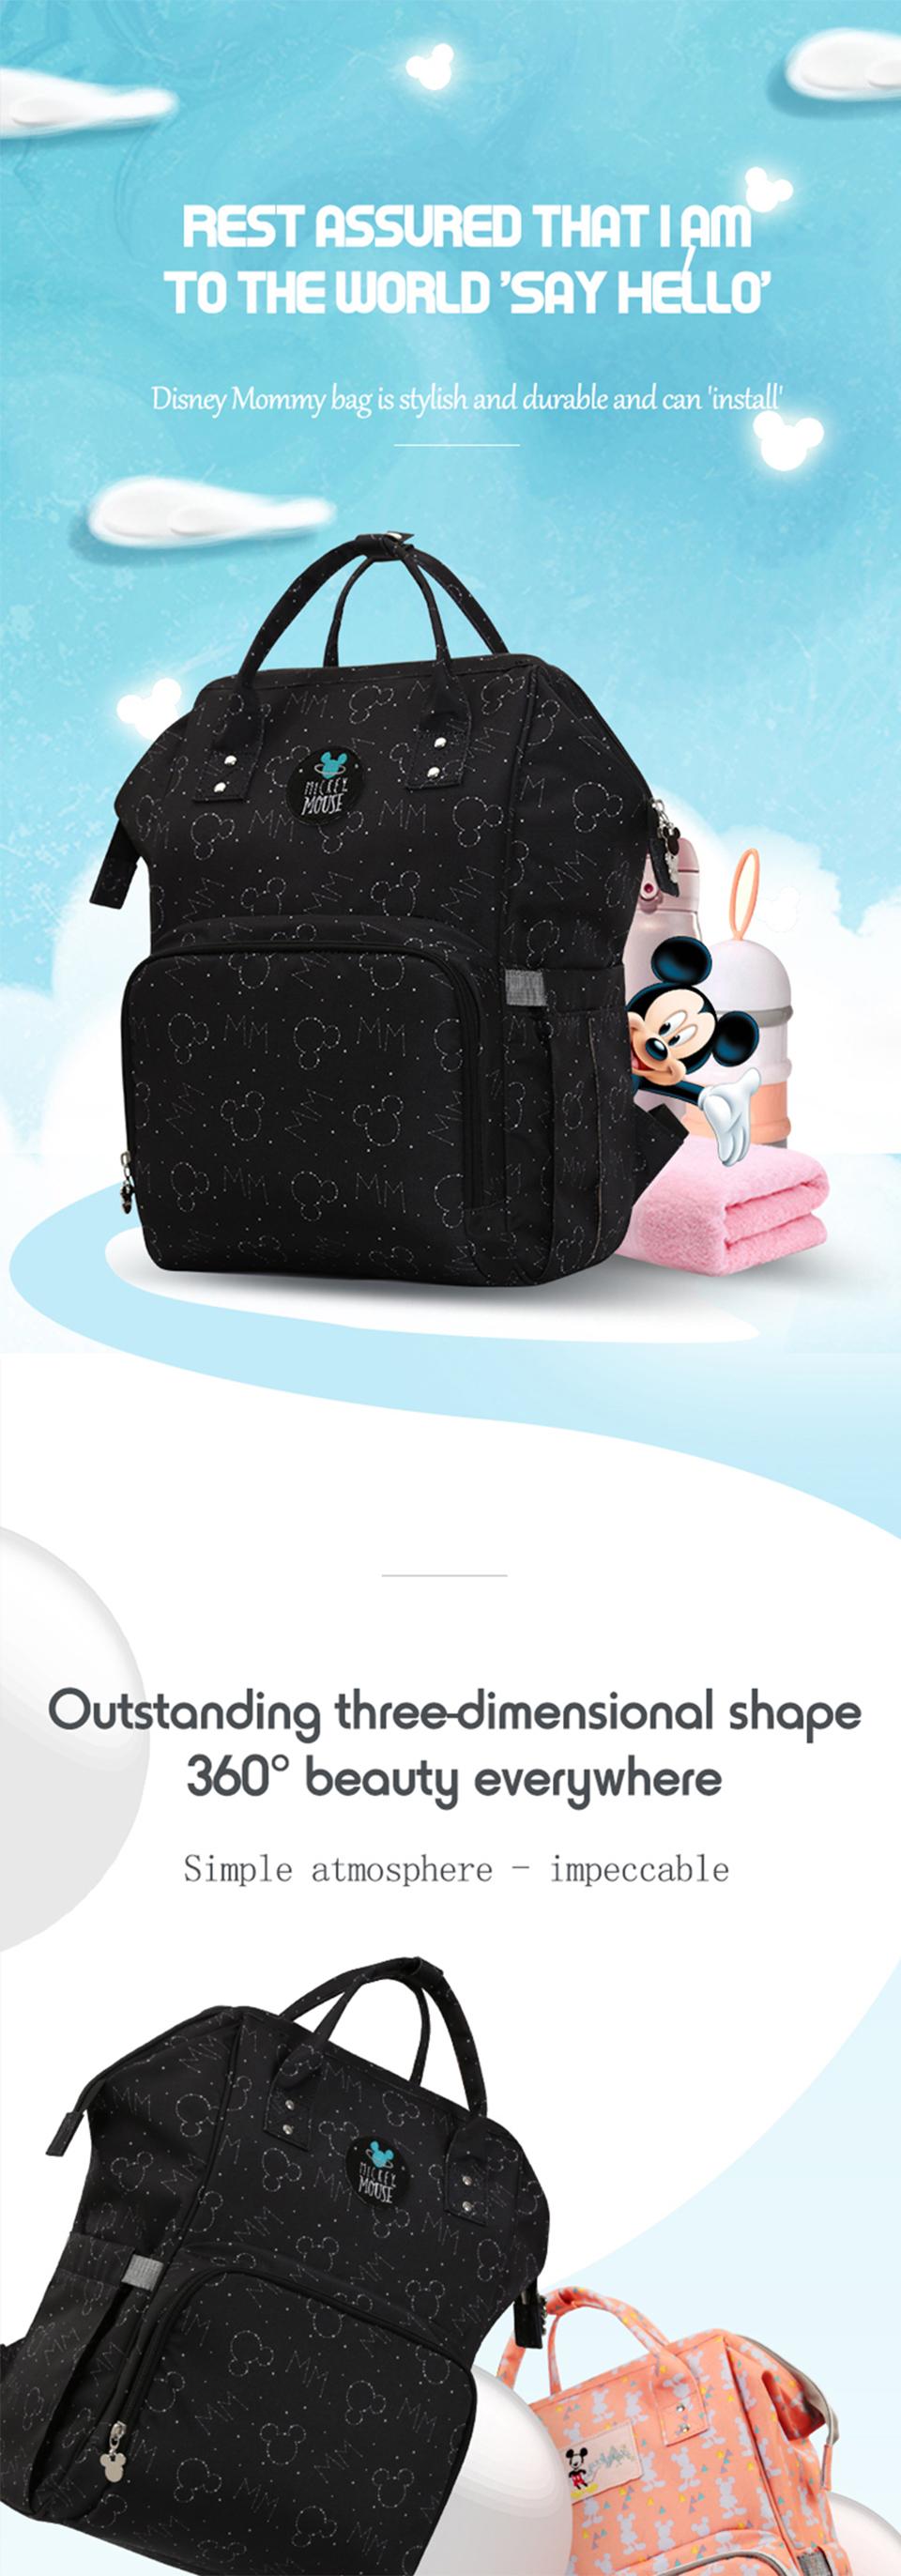 Disney Baby Diaper Bags USB Heating waterproof Maternity Nappy Diaper Stroller Bag Insulation Large Capacity Mochila Backpack